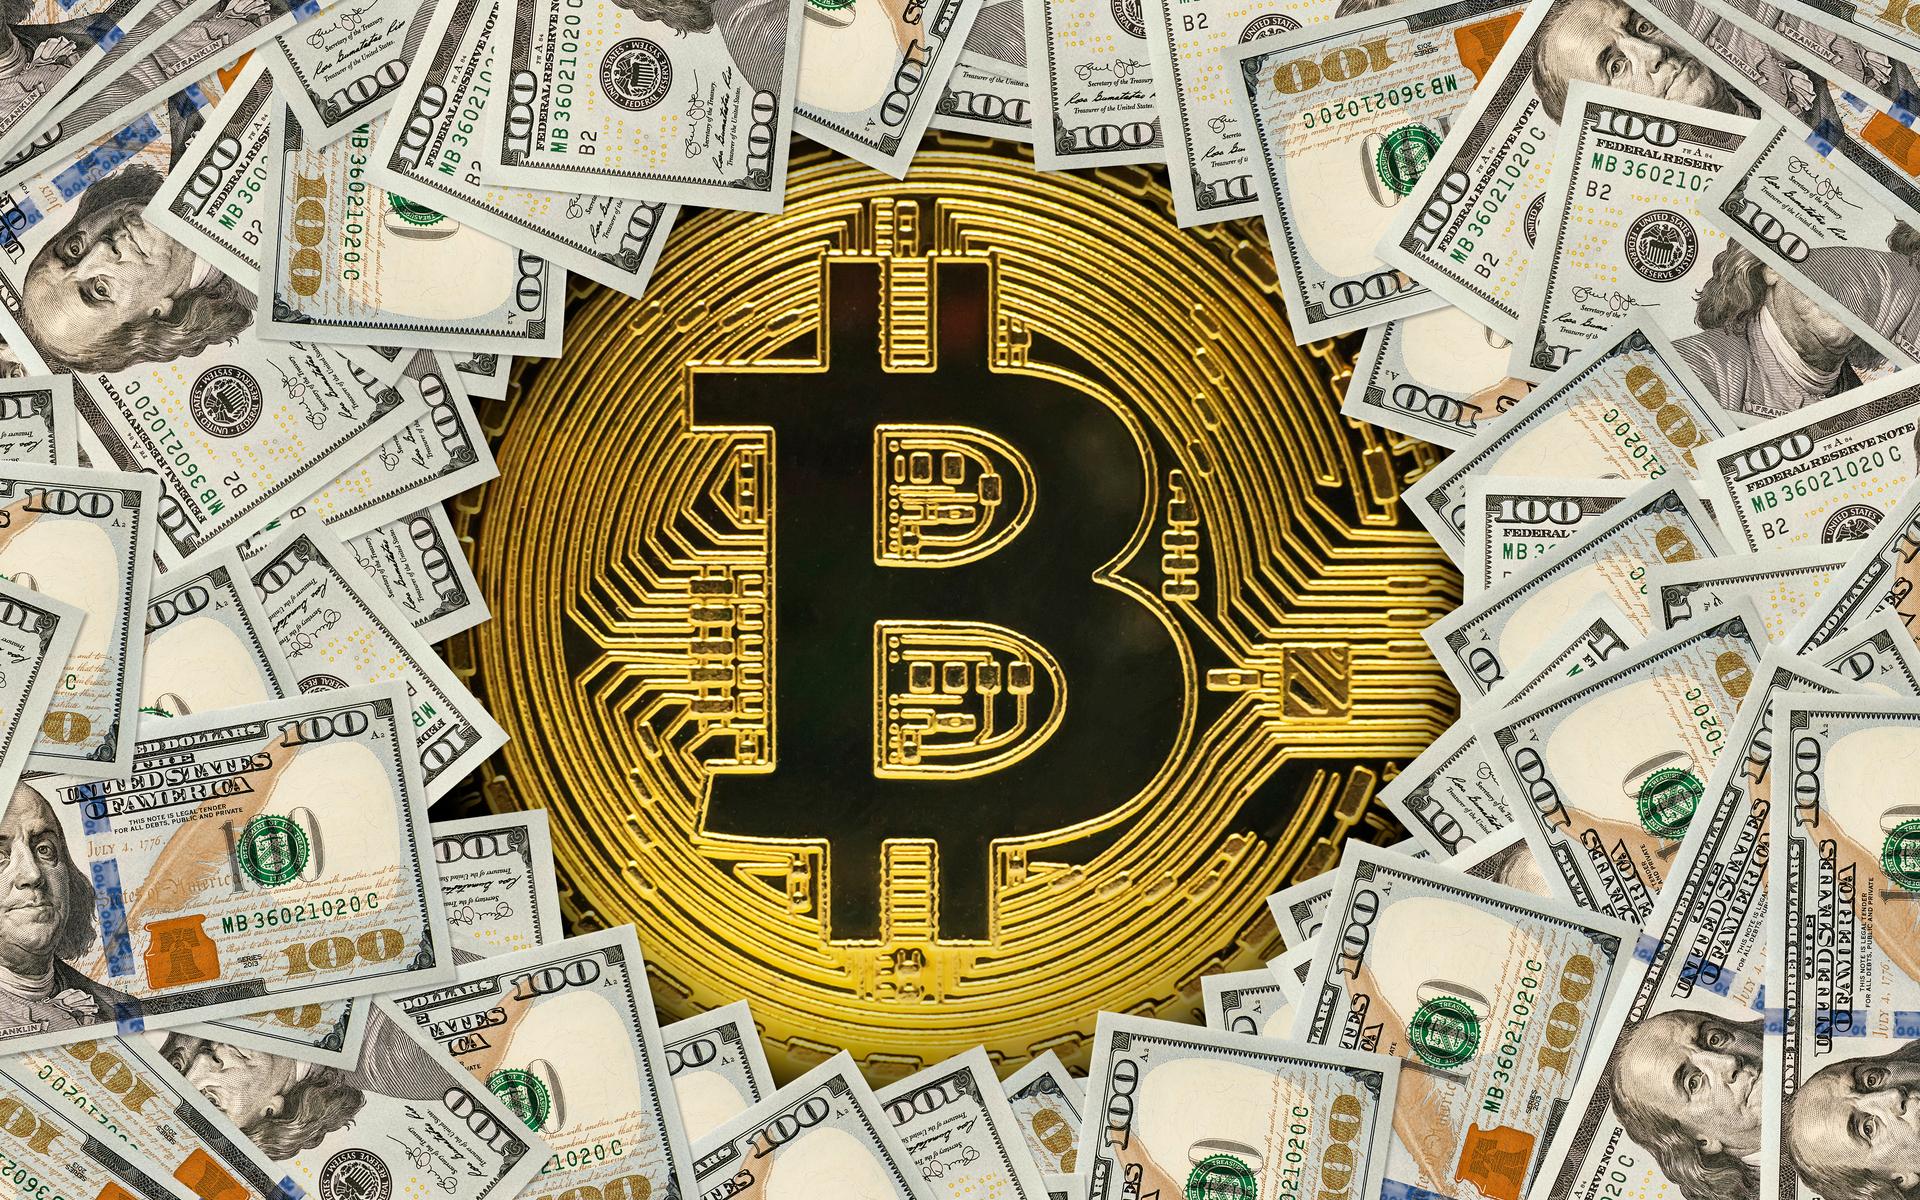 Bitcoin equals million USD